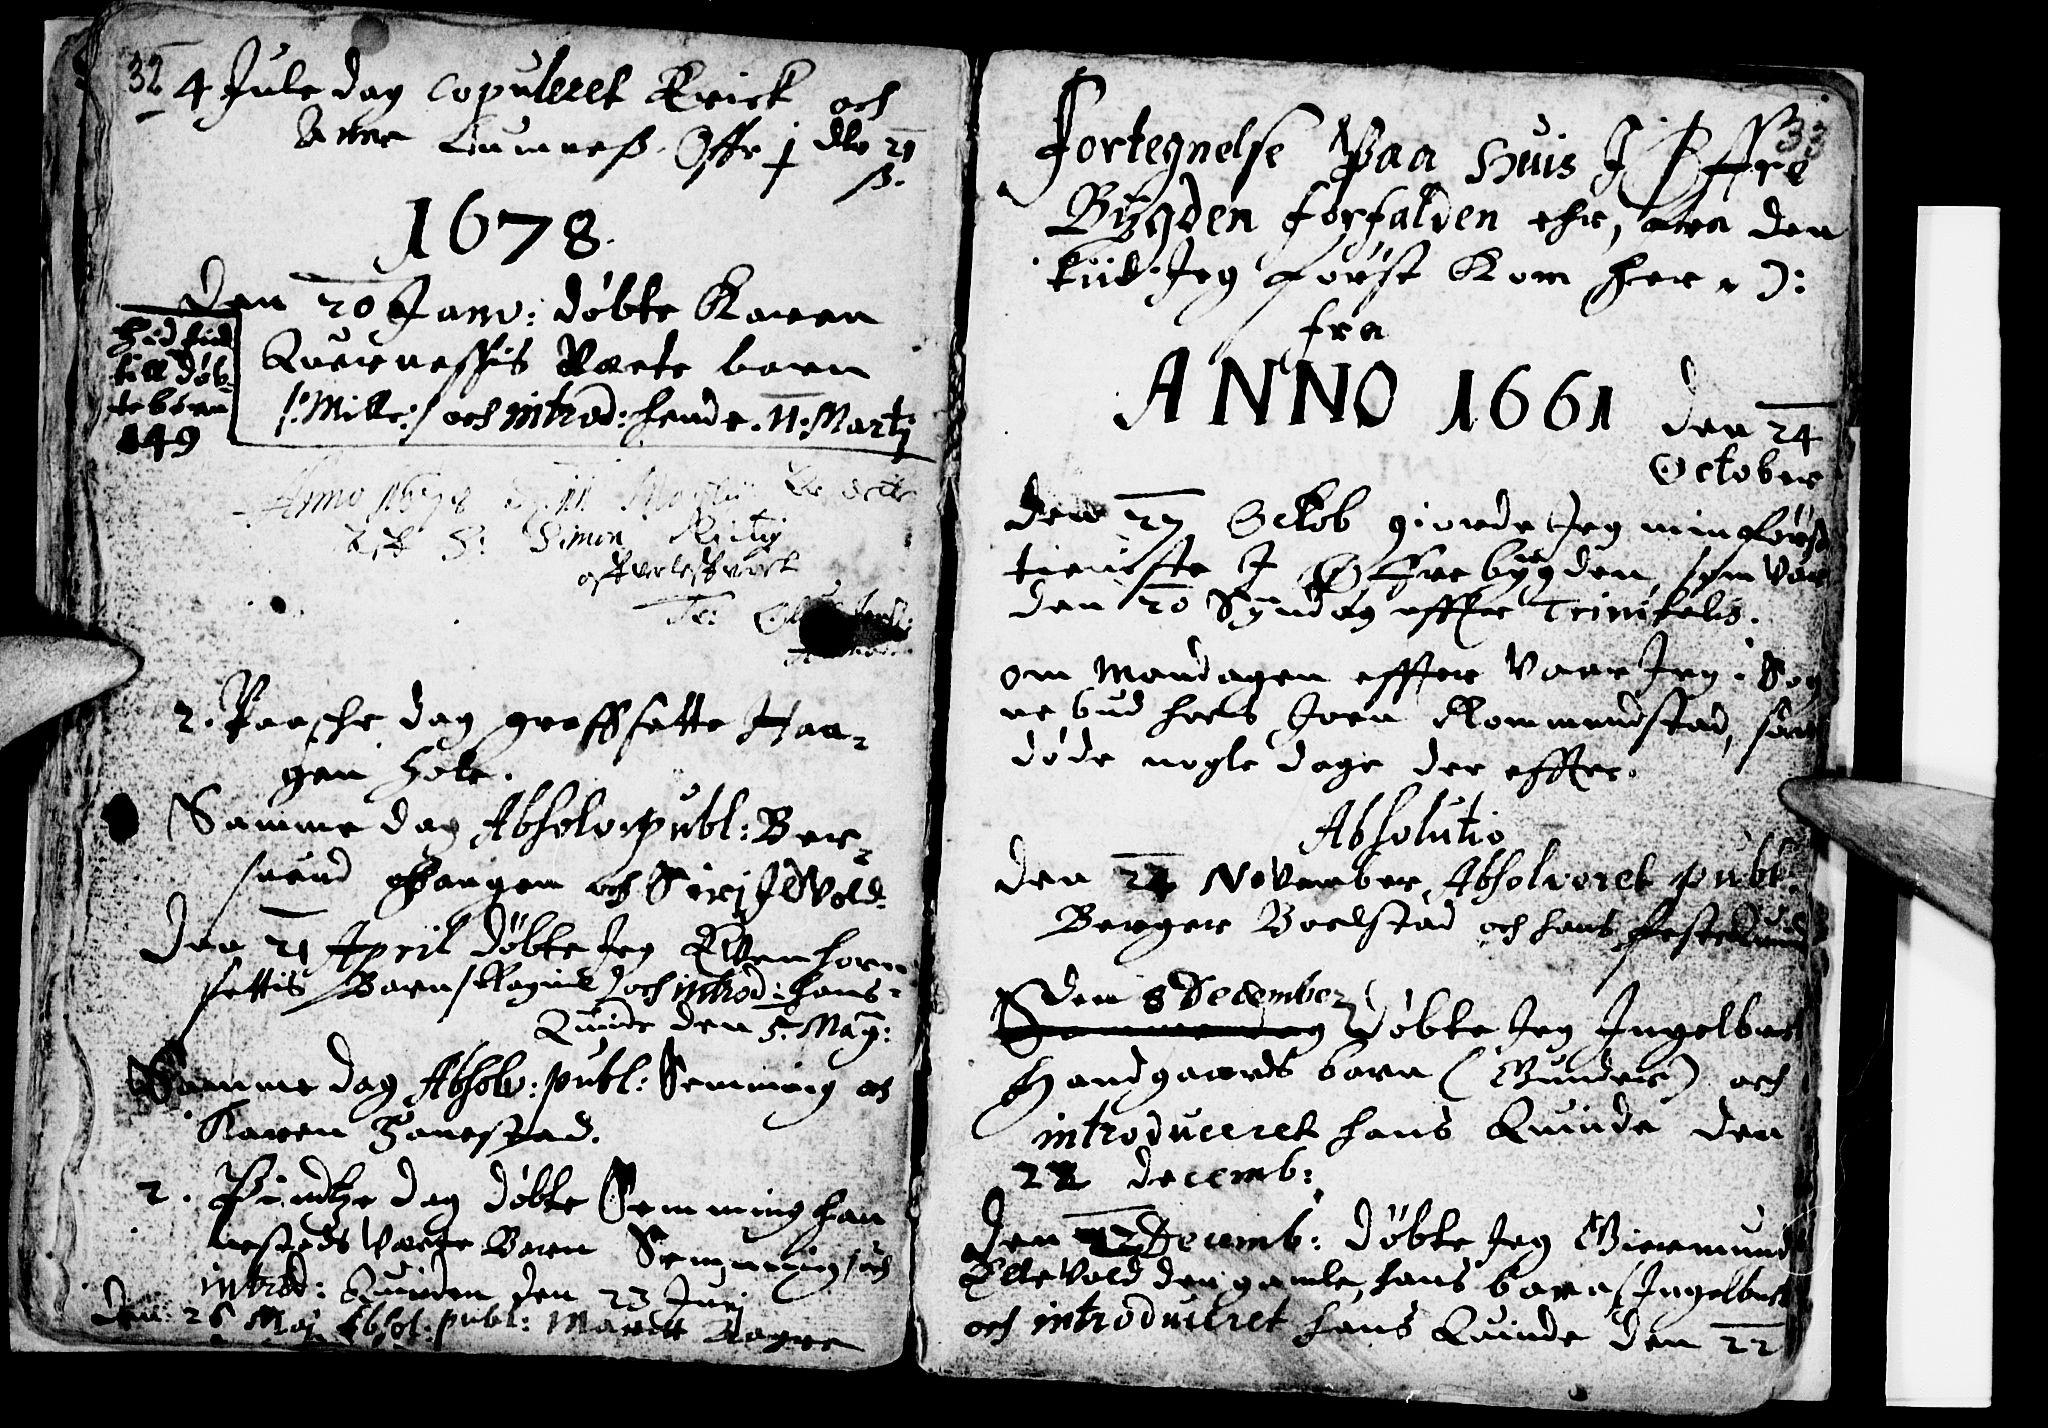 SAH, Åmot prestekontor, Hedmark, Ministerialbok nr. 1 /2, 1661-1680, s. 32-33